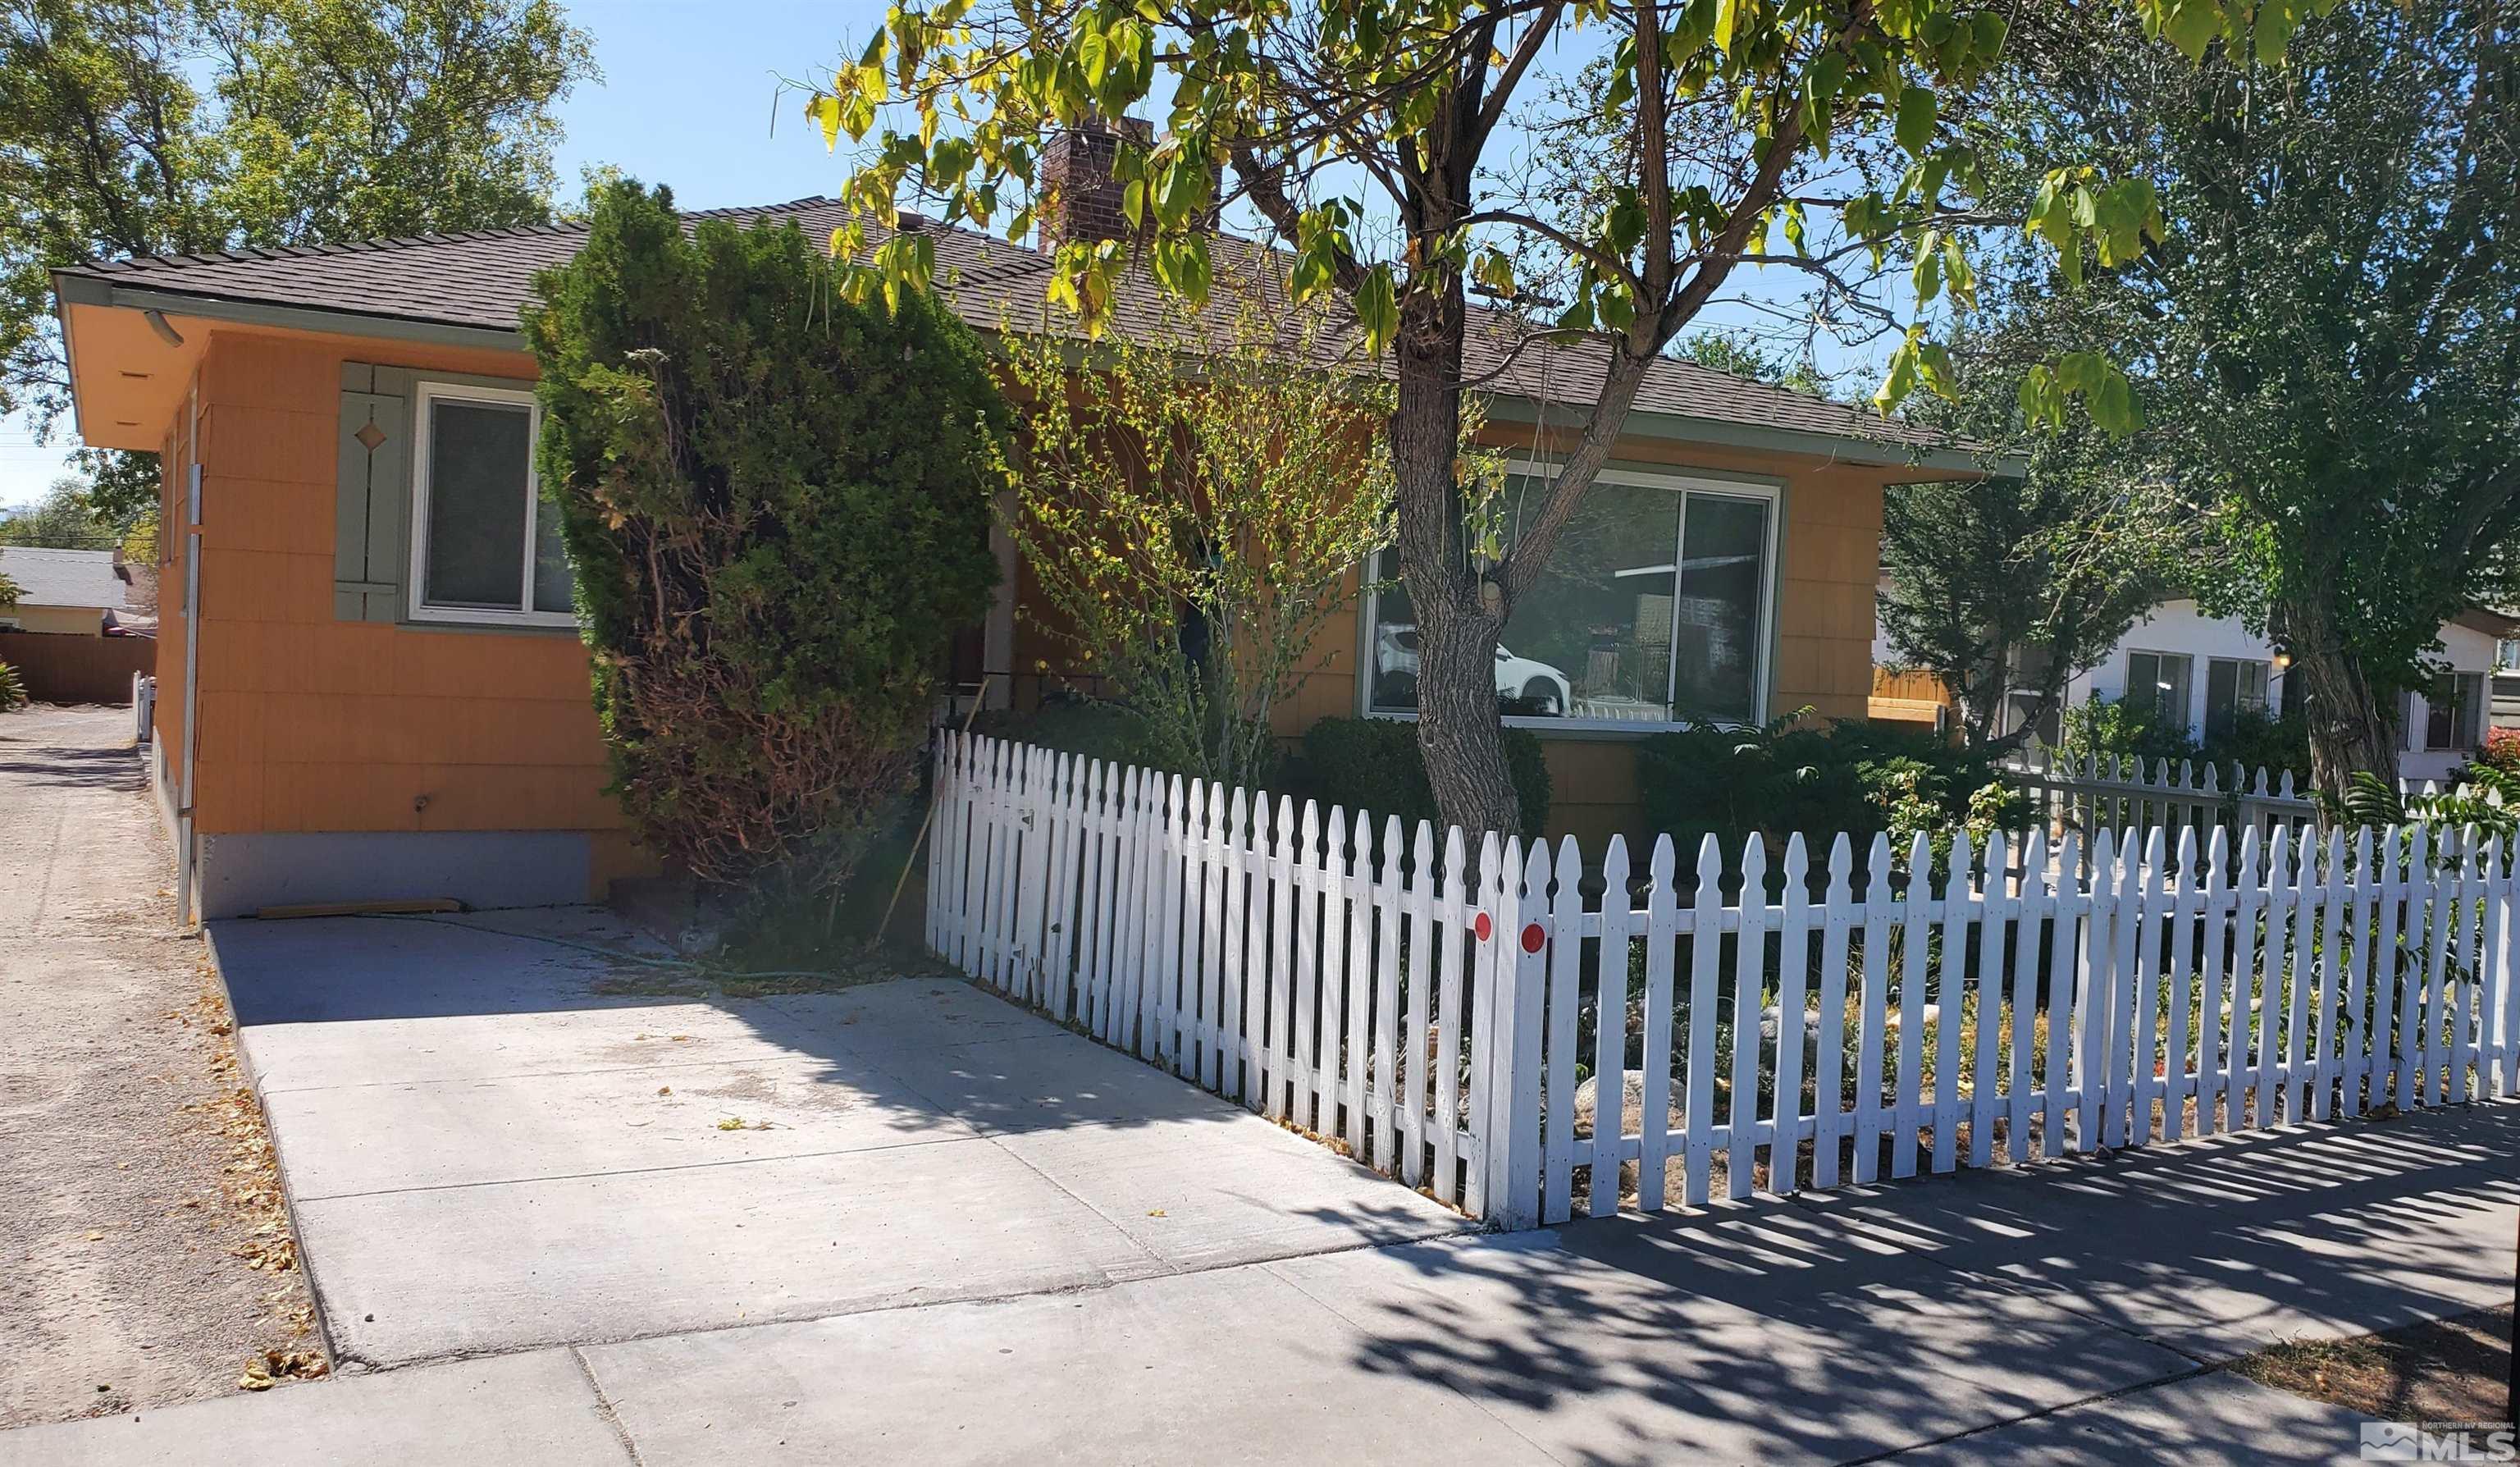 Image for 432 & 434 Vassar Street, Reno, NV 89502